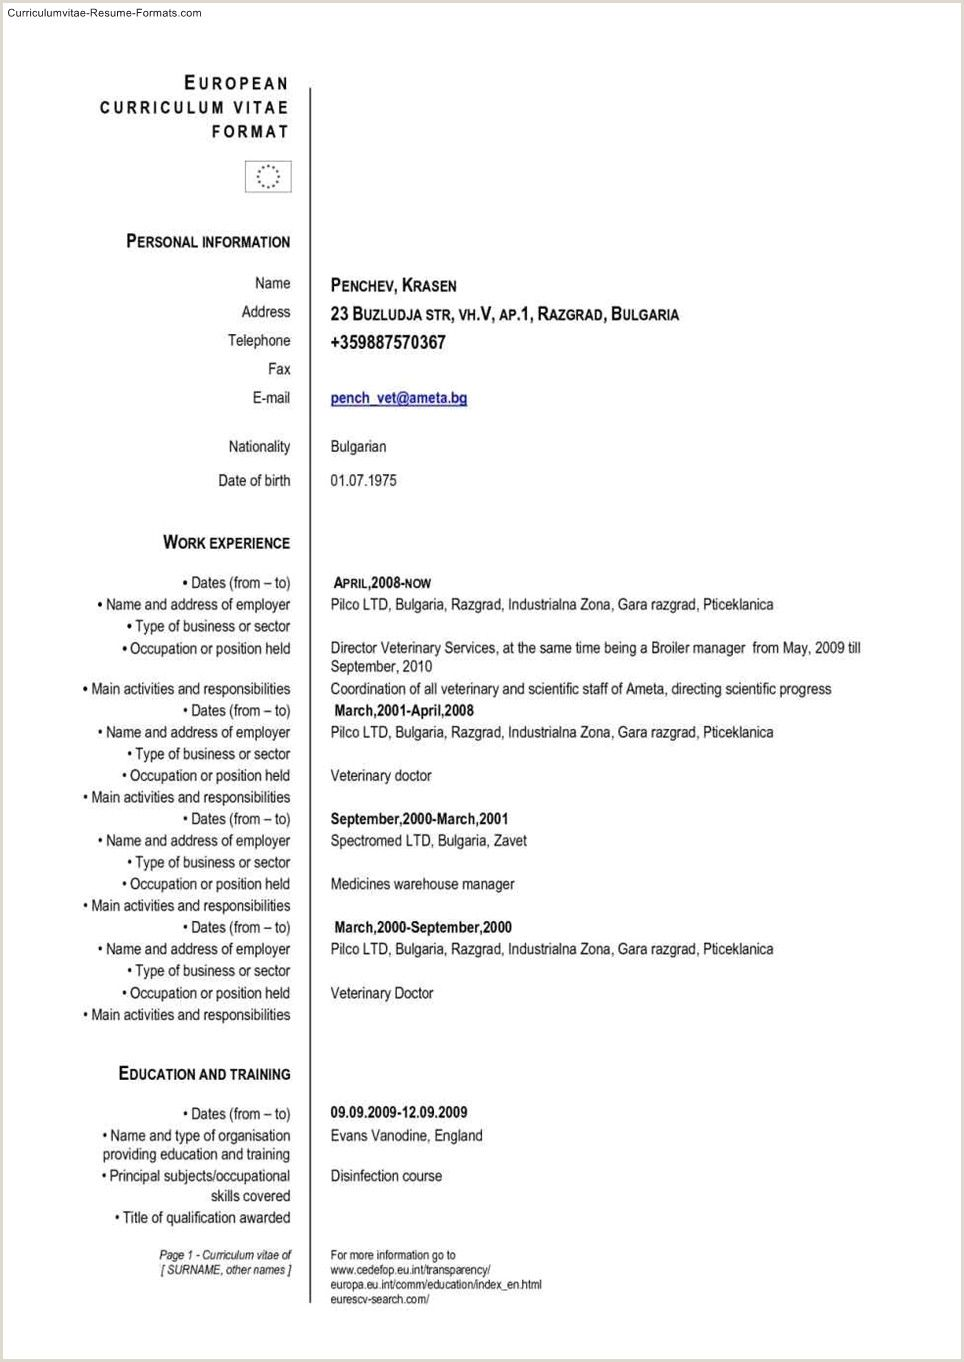 Europass Cv format Pdf in 2020 Curriculum vitae format